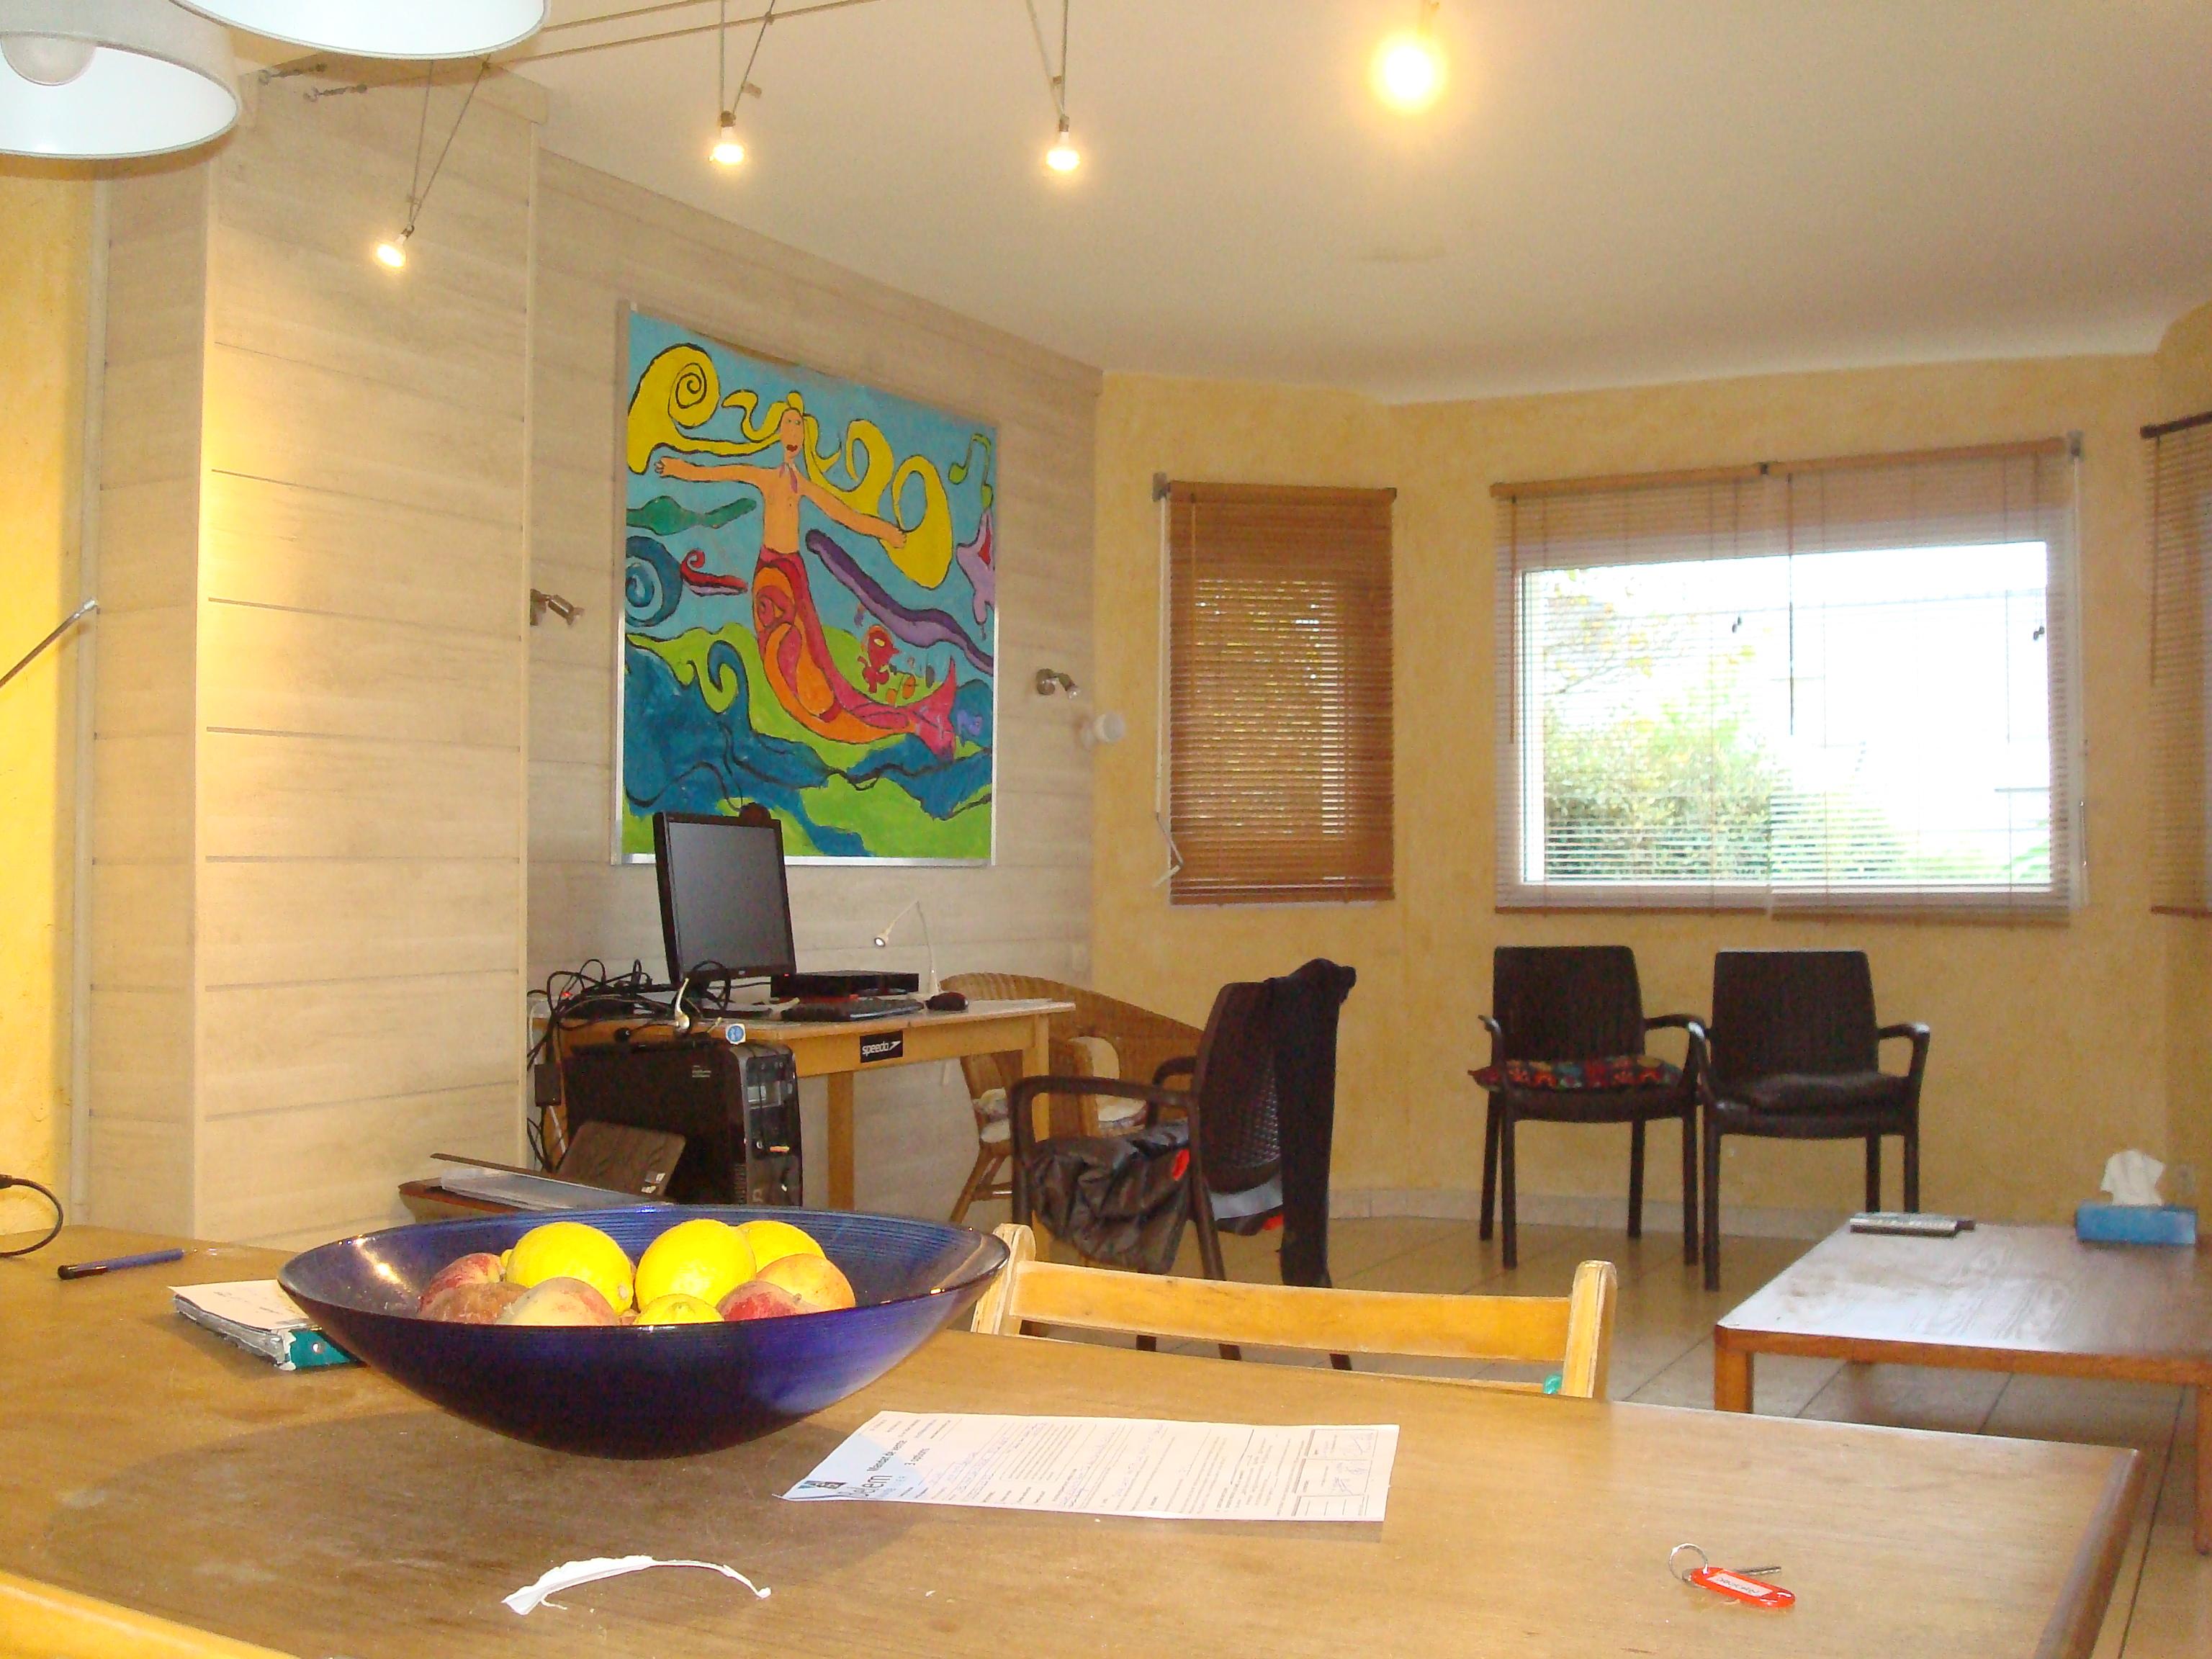 Maison t6 brest le hildy 217 600 fai brest for Agence immobiliere brest